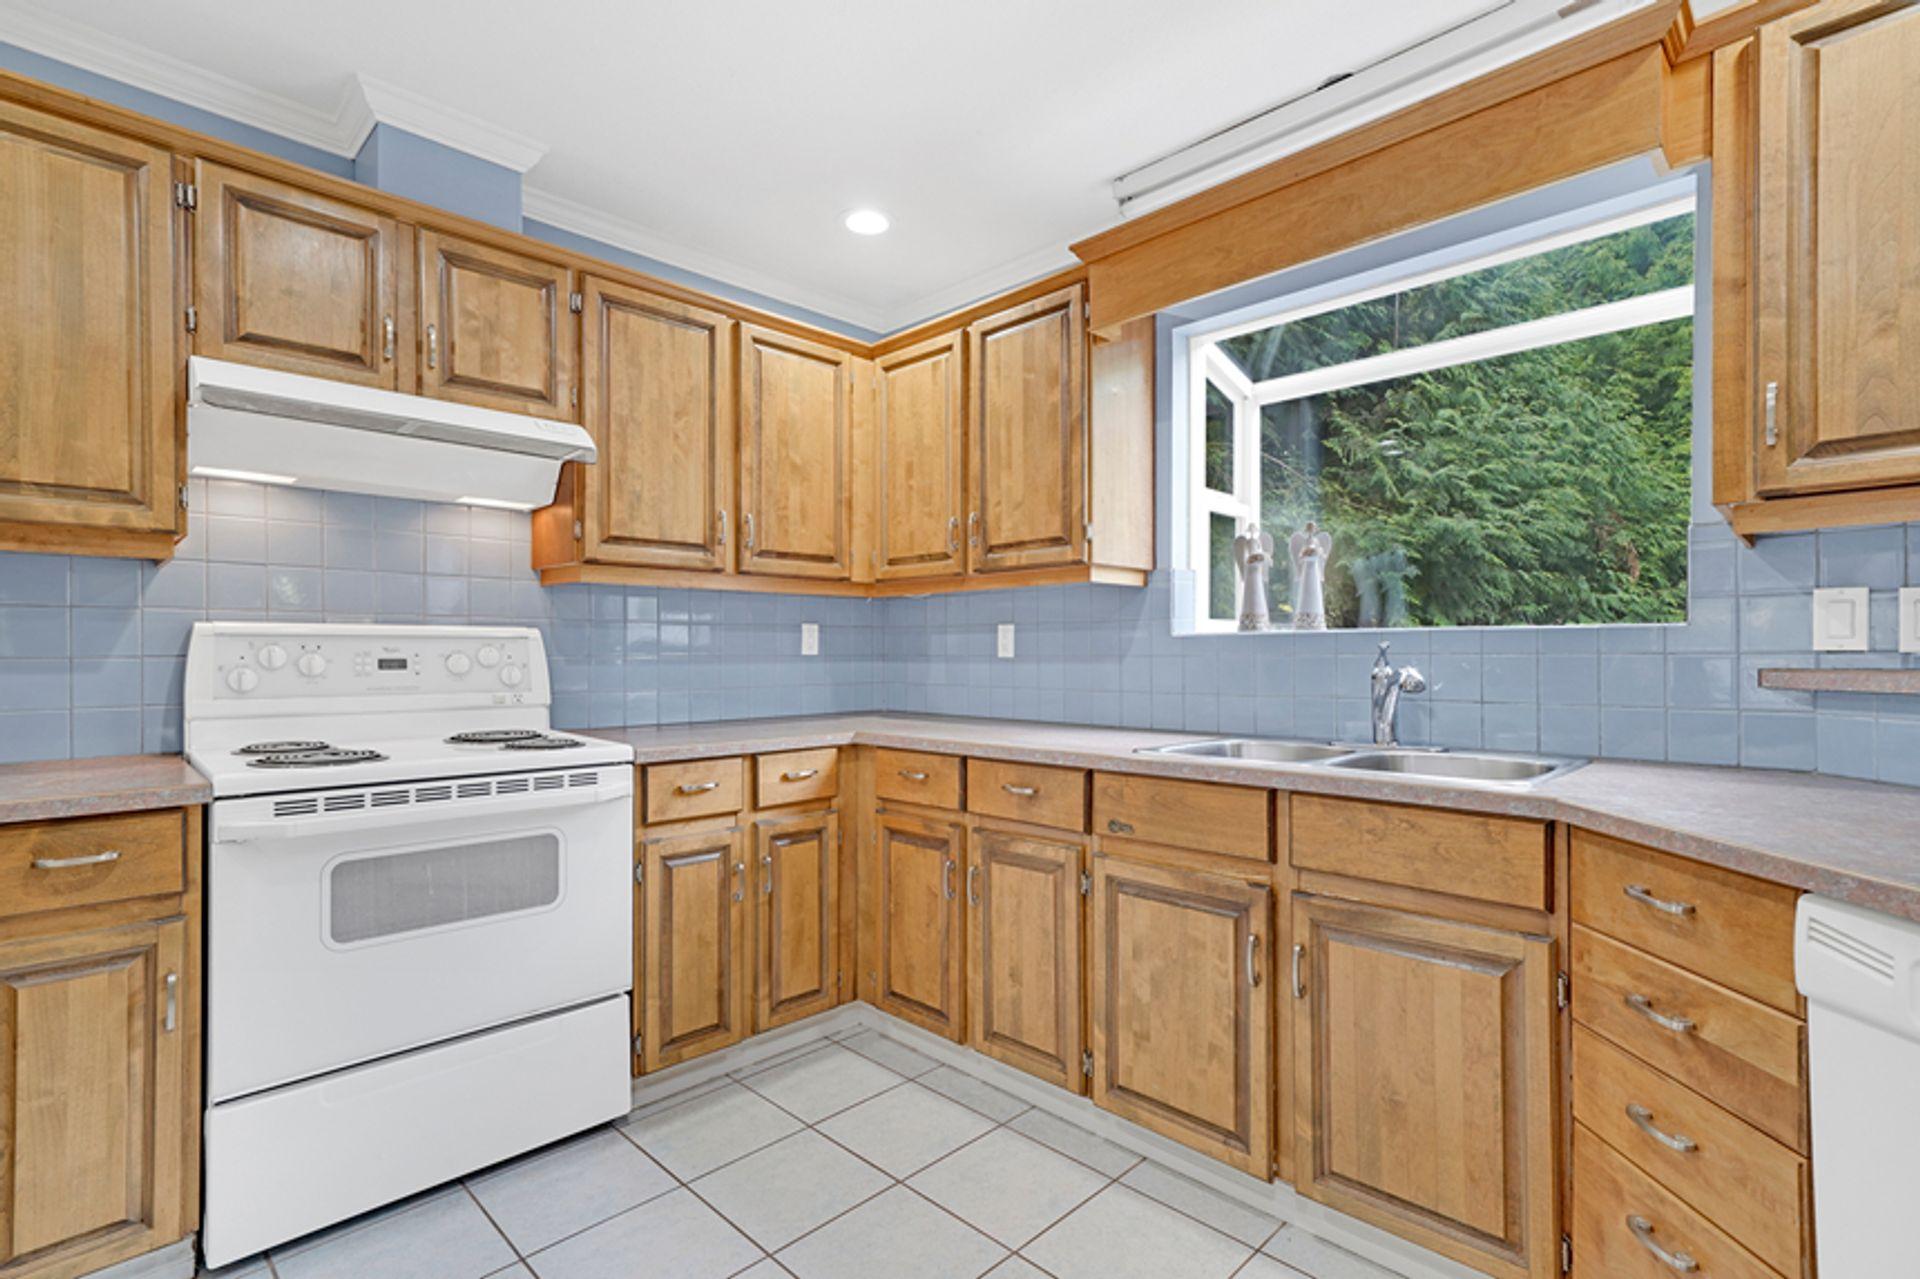 2d-main-kitchen-31 at 836 Irvine Street, Meadow Brook, Coquitlam